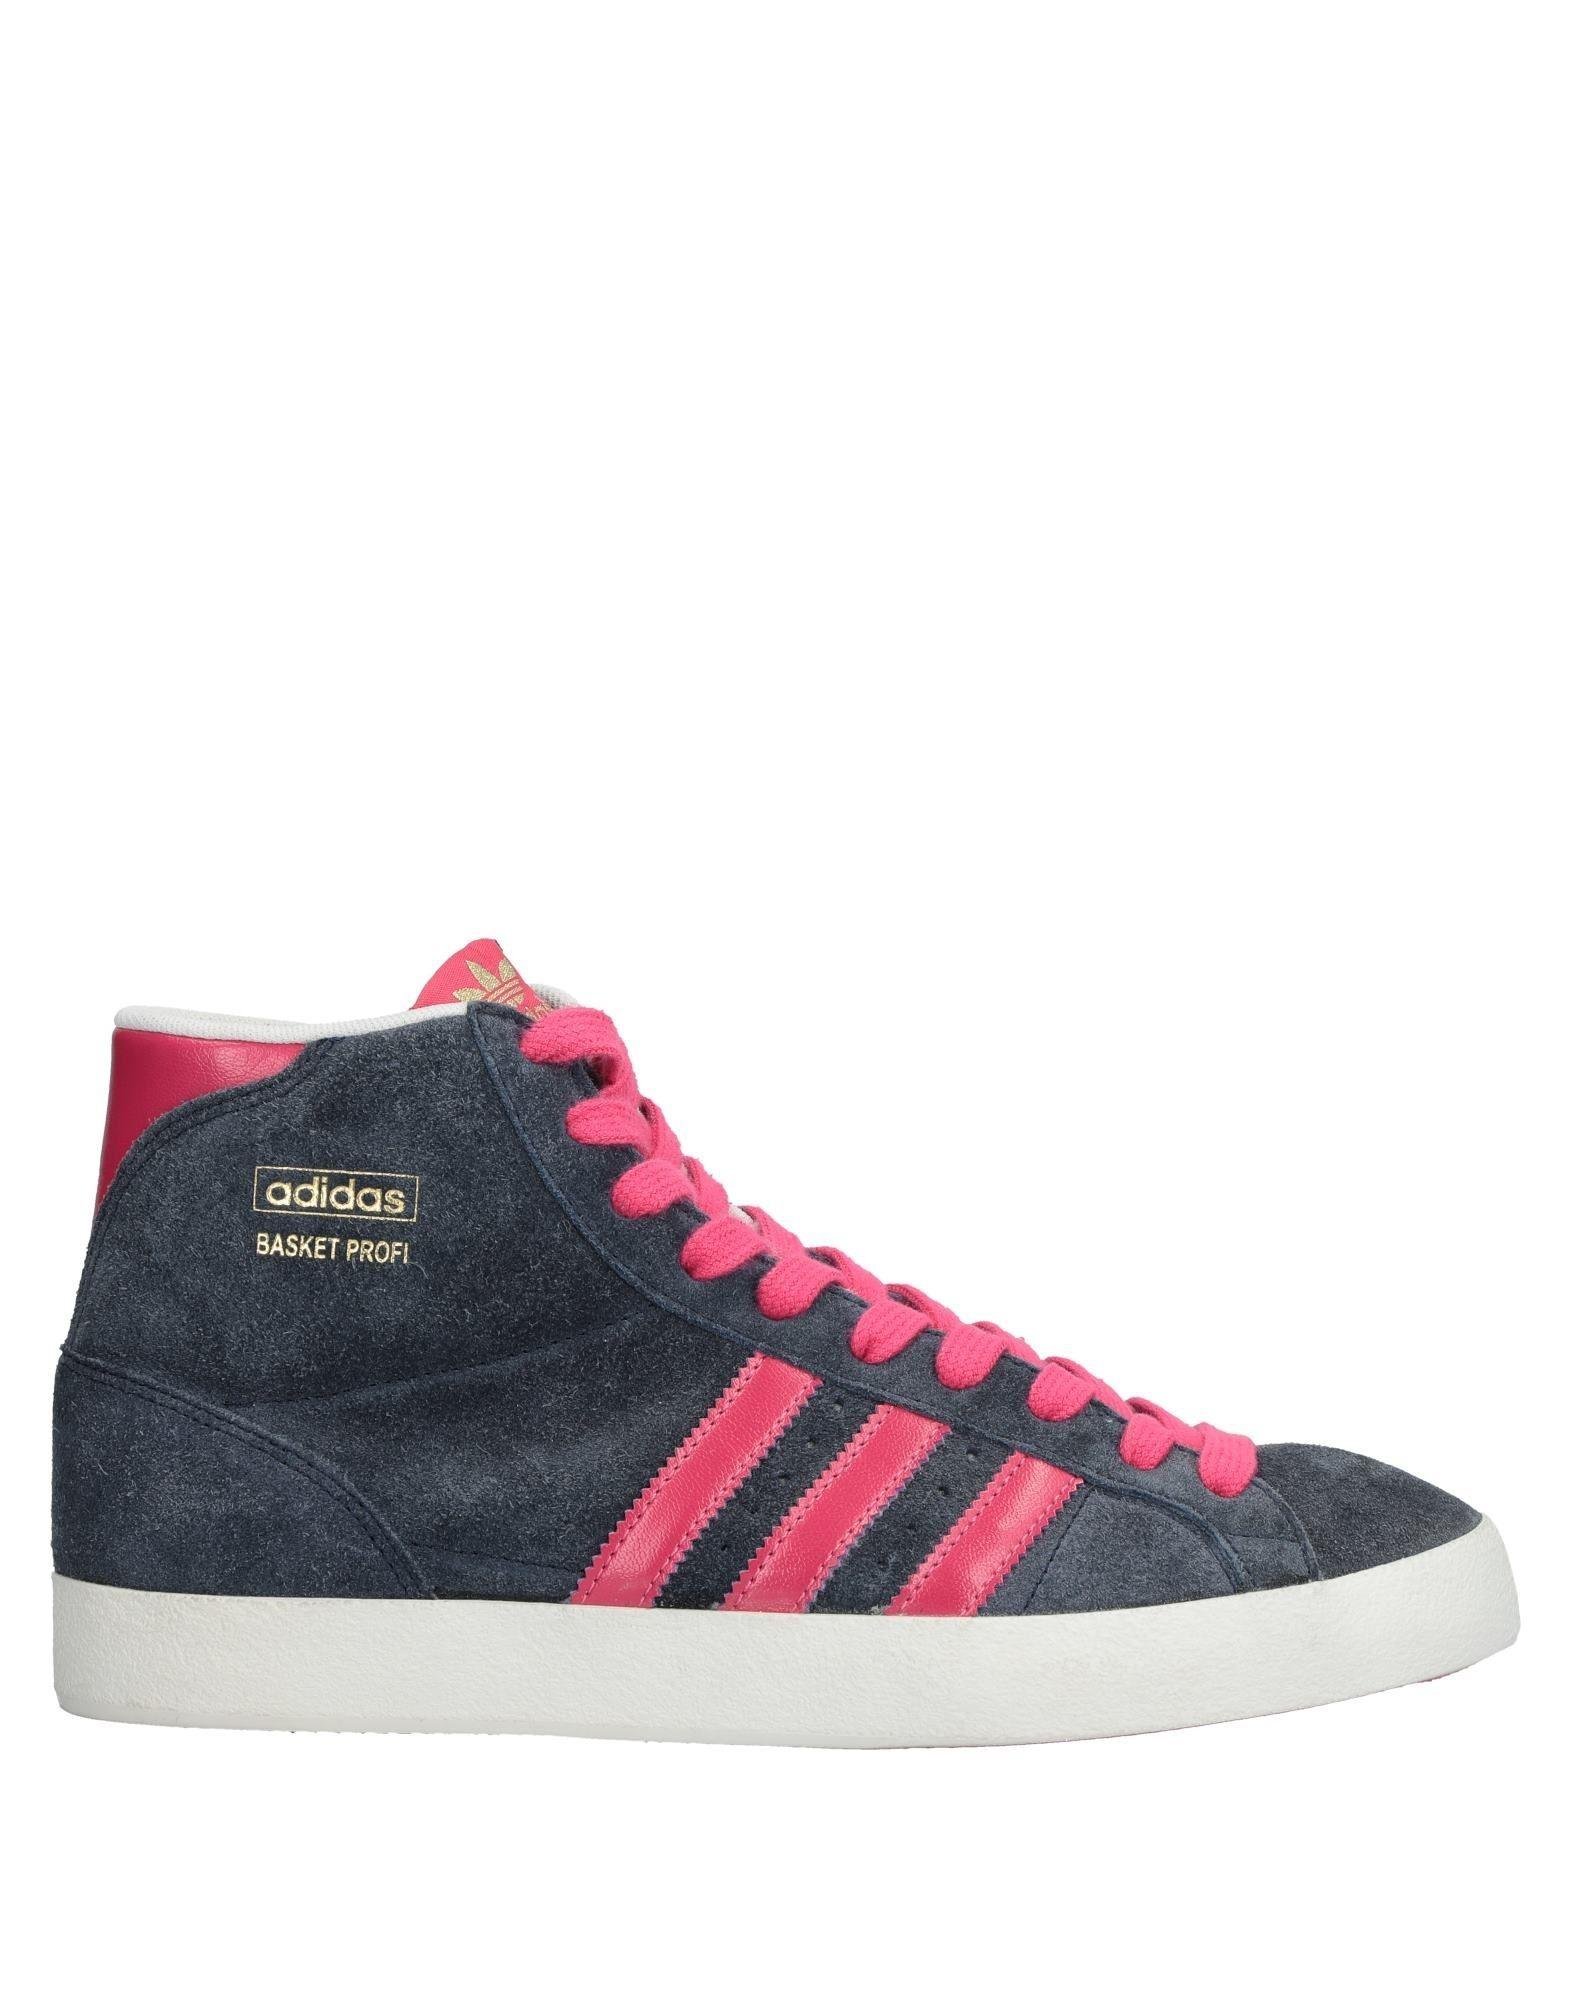 5791beaa892 ... various design adidas Originals. Women s High-tops Trainers 8bf6b b246e  ...